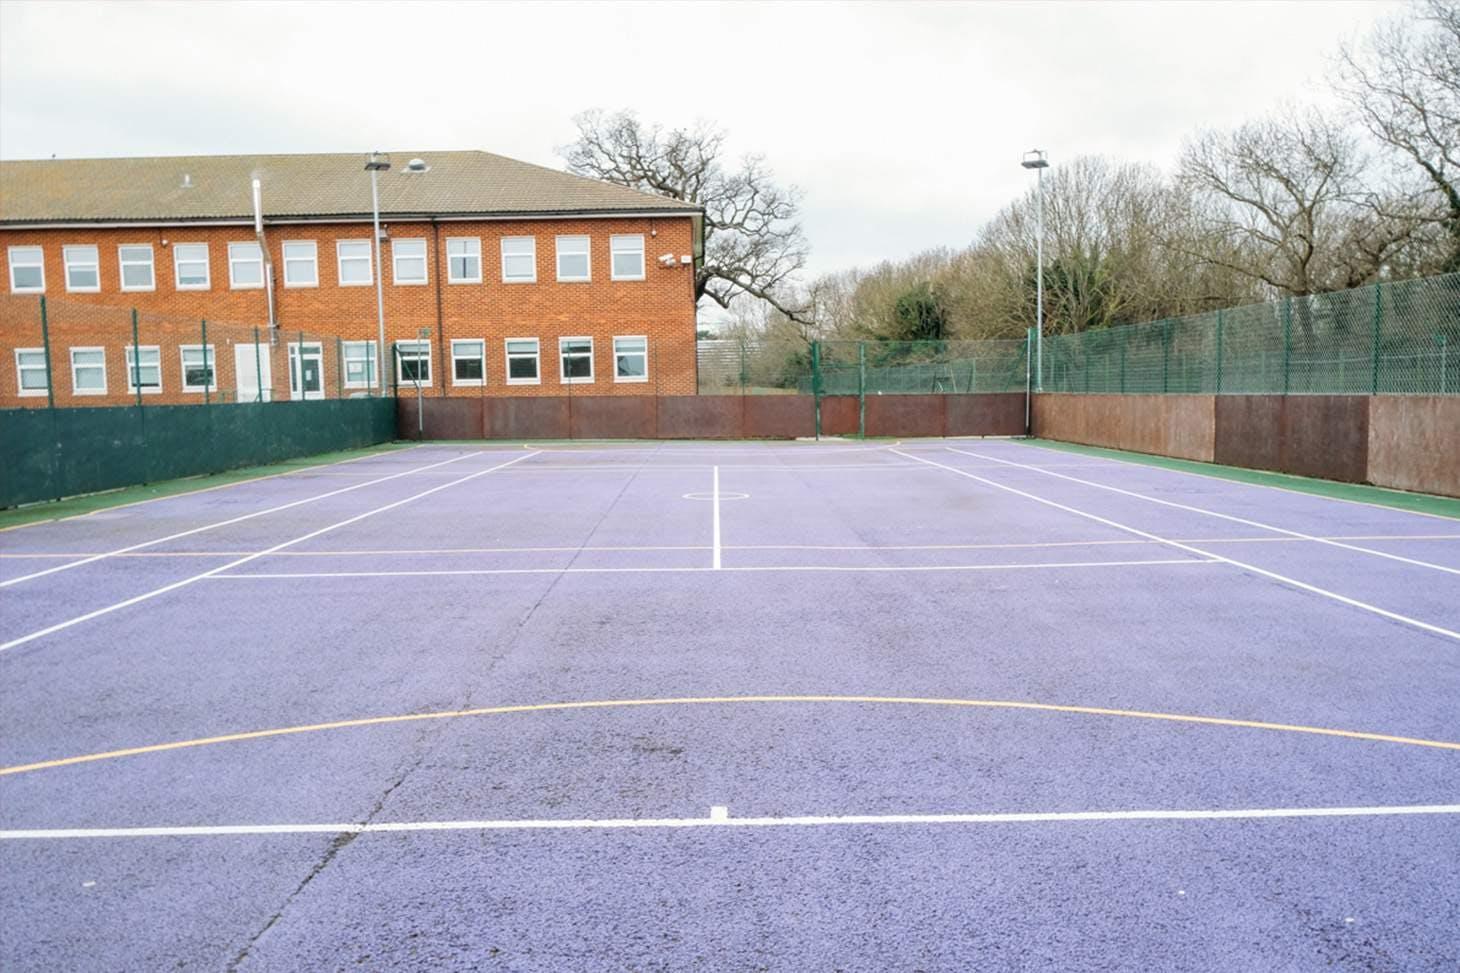 Chislehurst & Sidcup Grammar School Outdoor | Hard (macadam) netball court